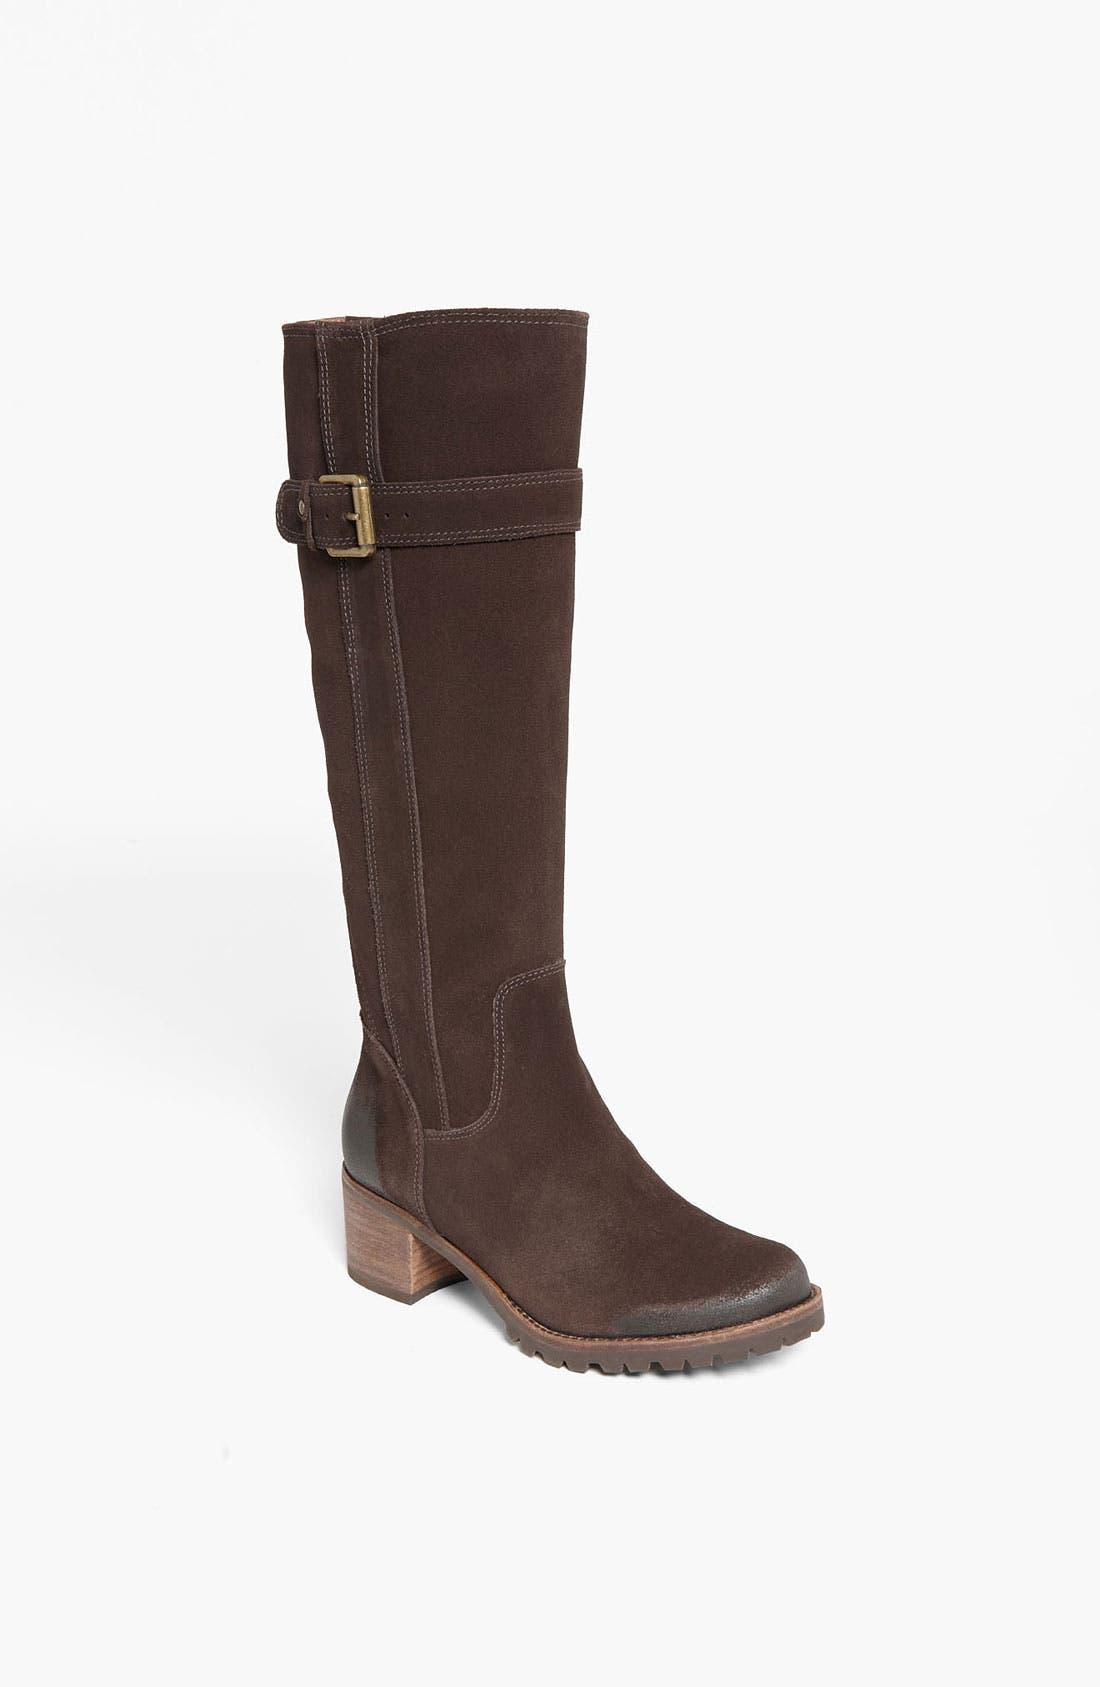 Alternate Image 1 Selected - Corso Como 'Gage' Boot